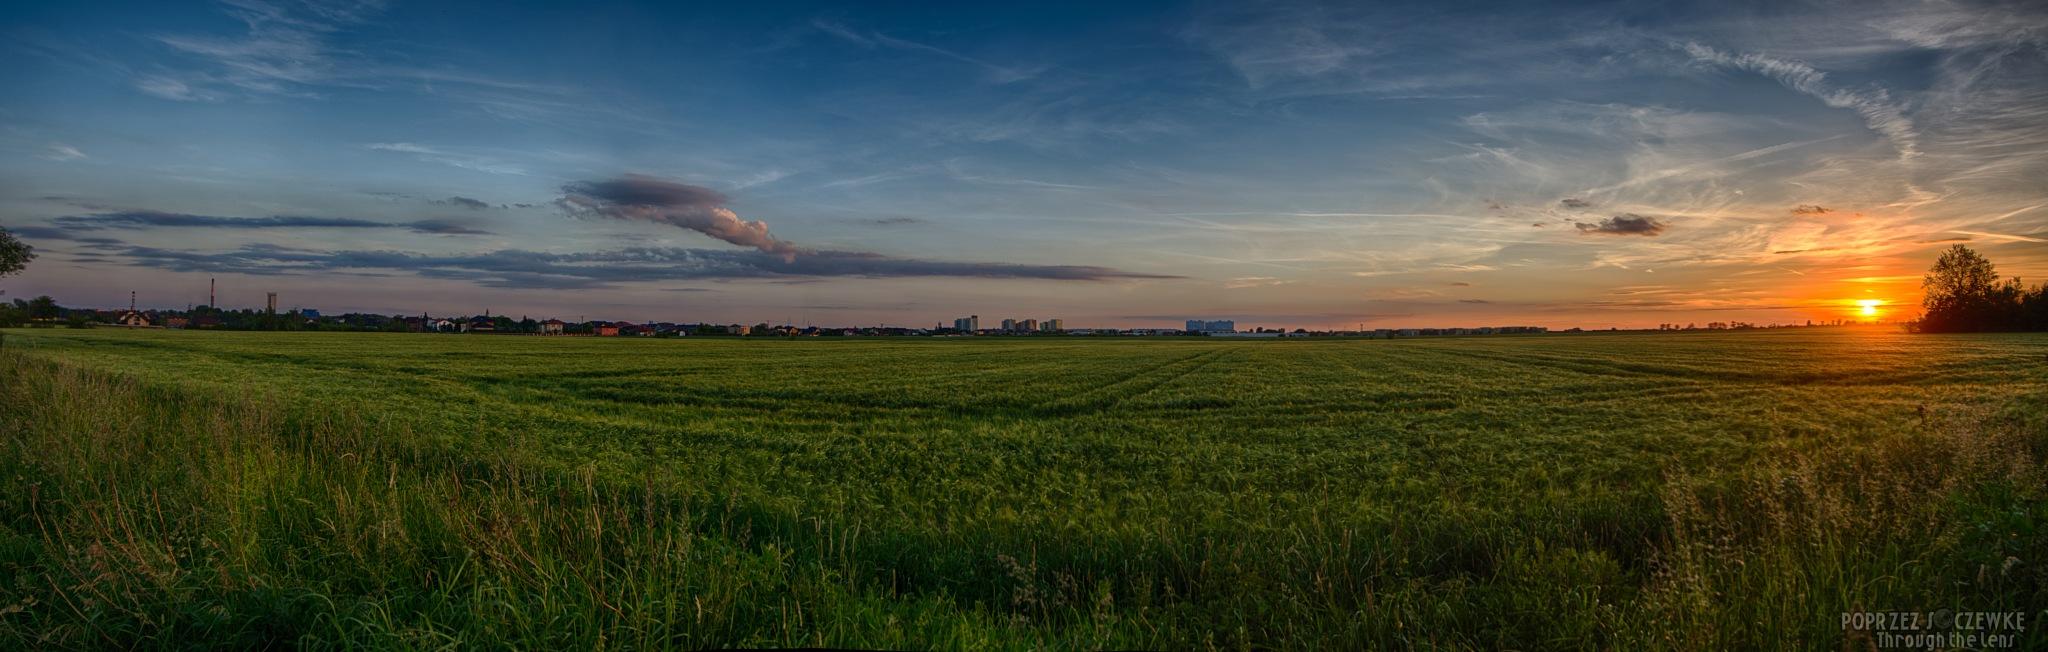 pano sunset by Rafal Grzegorz